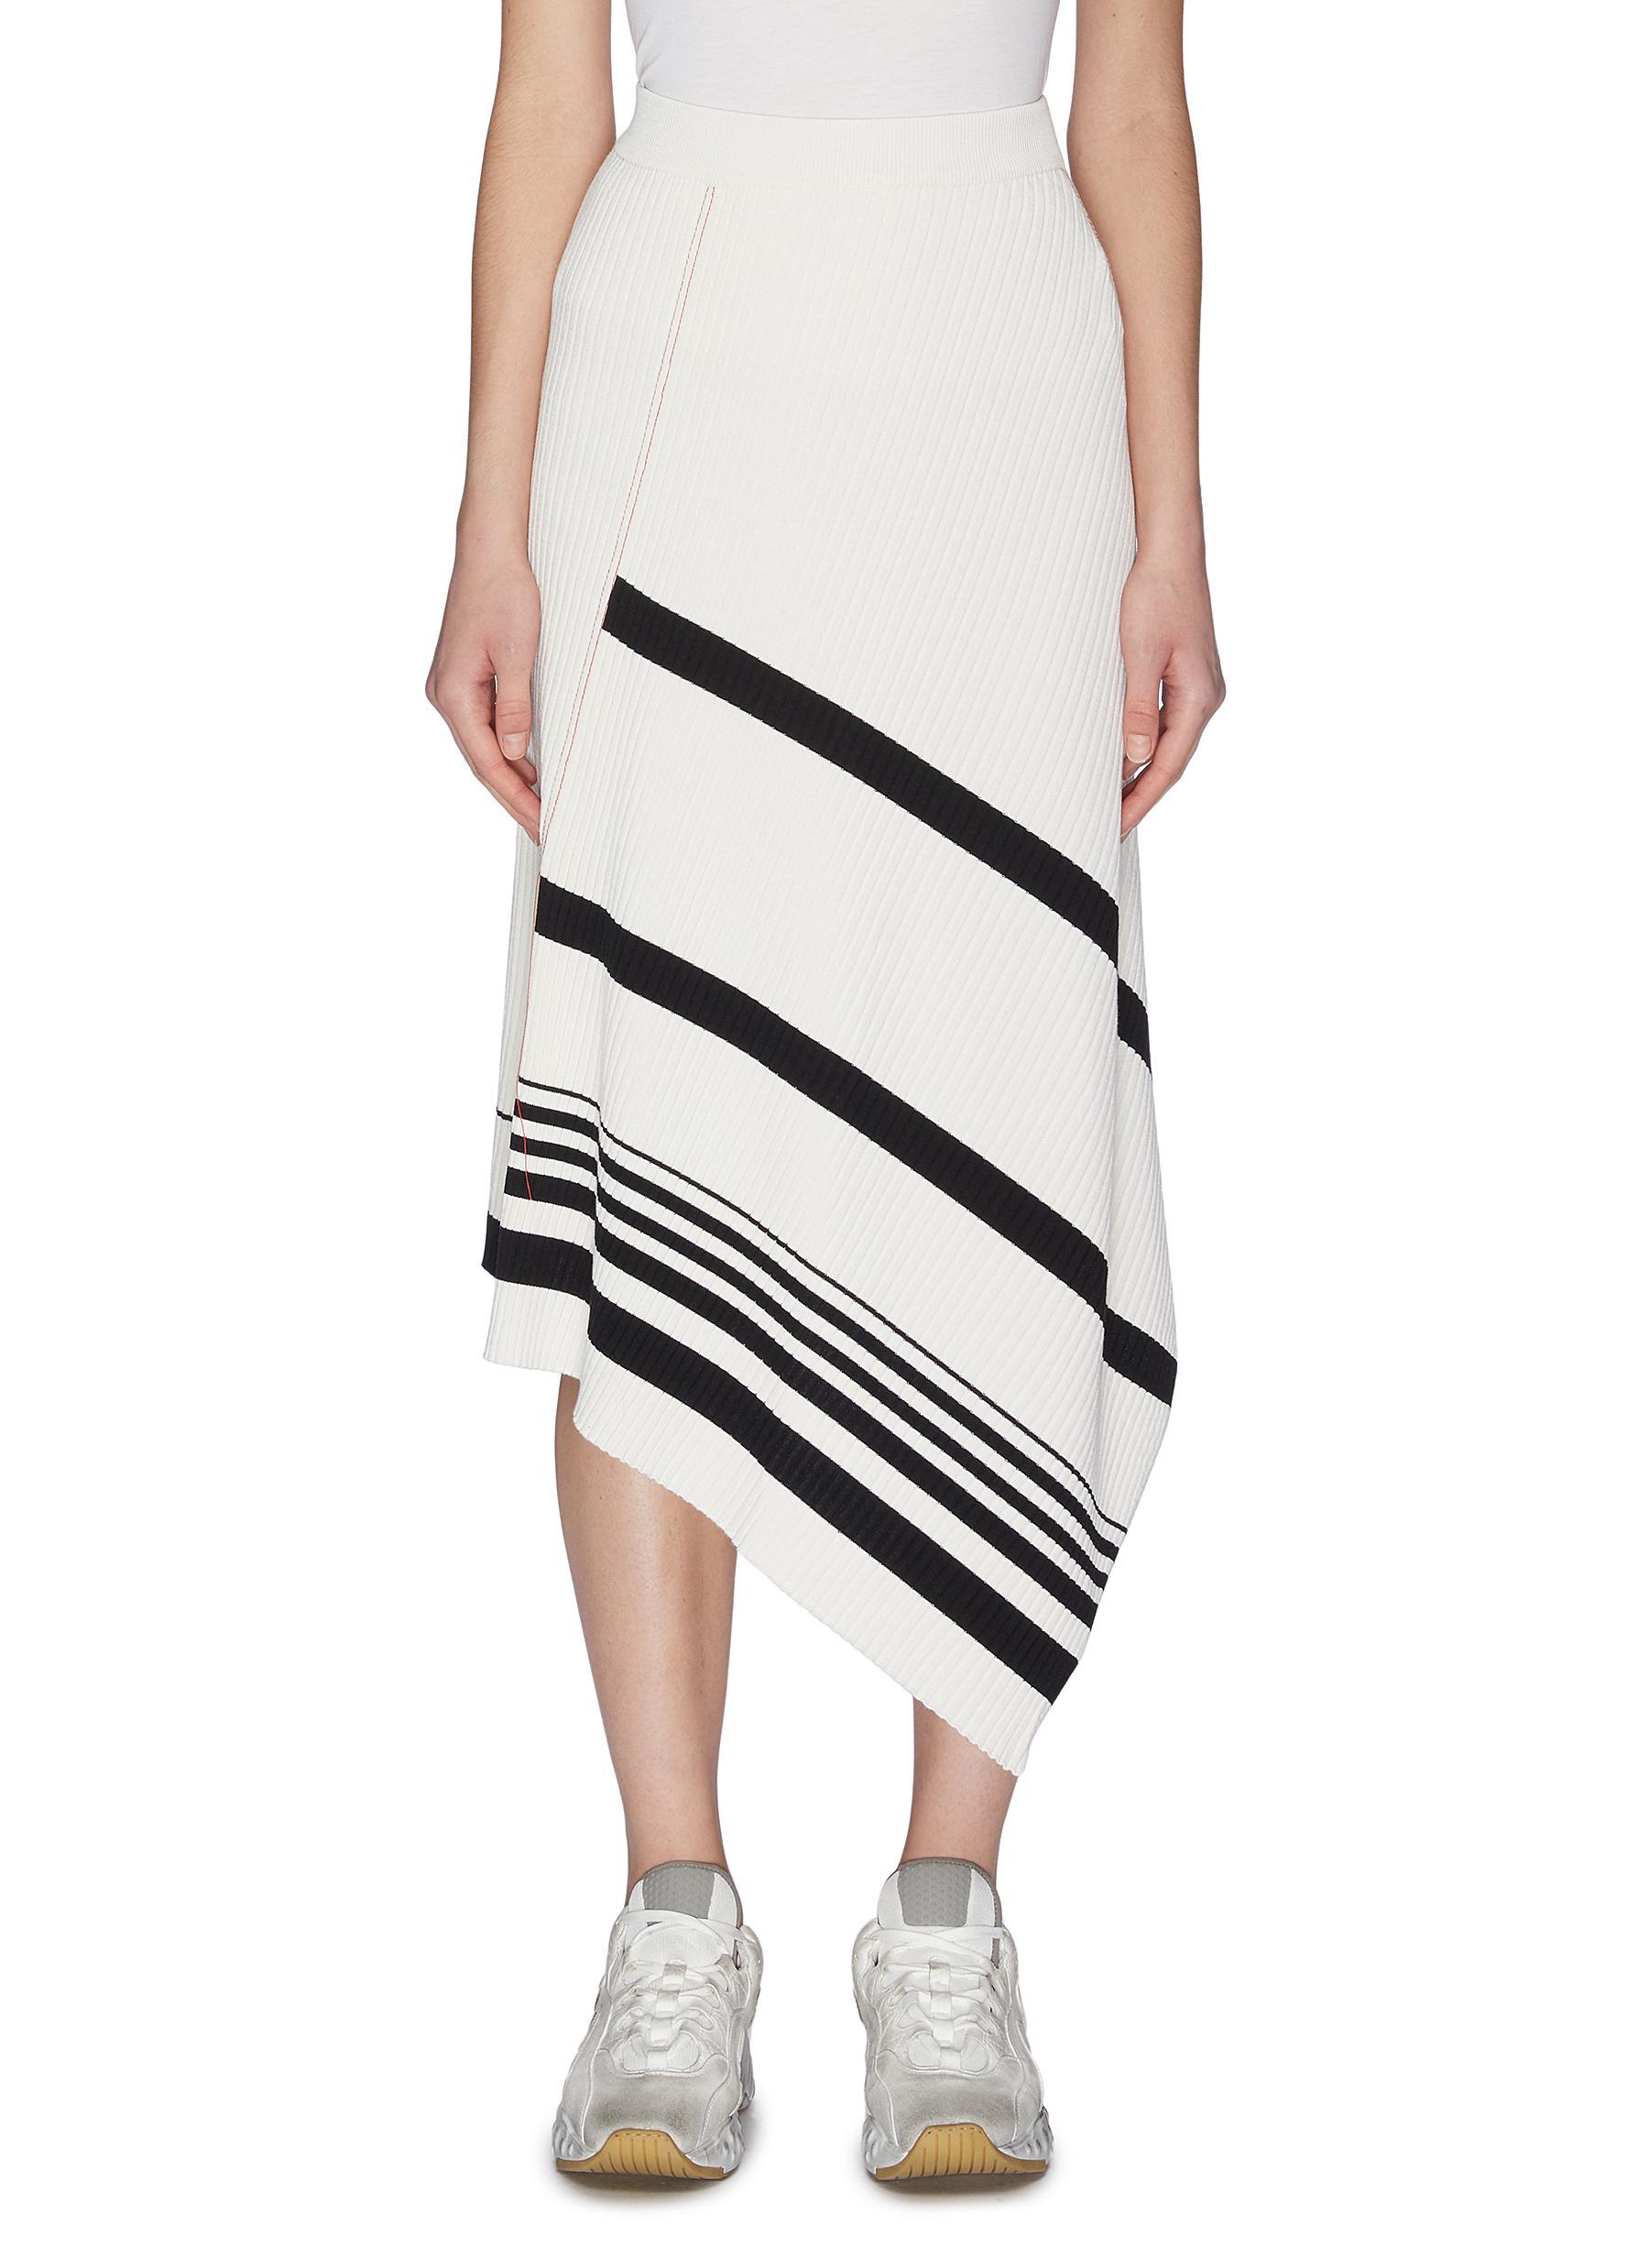 shop Mrz 'Gonna Coste' asymmetric side slit rib knit skirt online